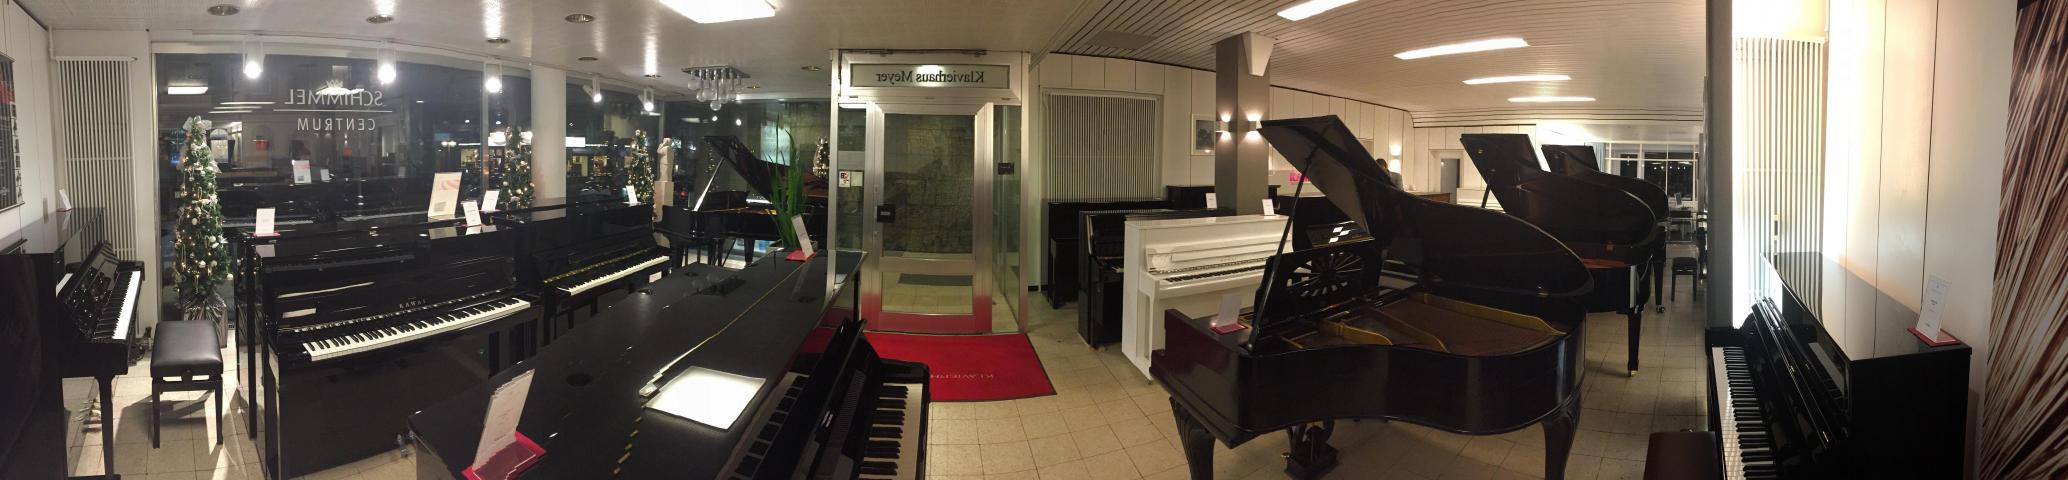 Klavierhaus Meyer GmbH